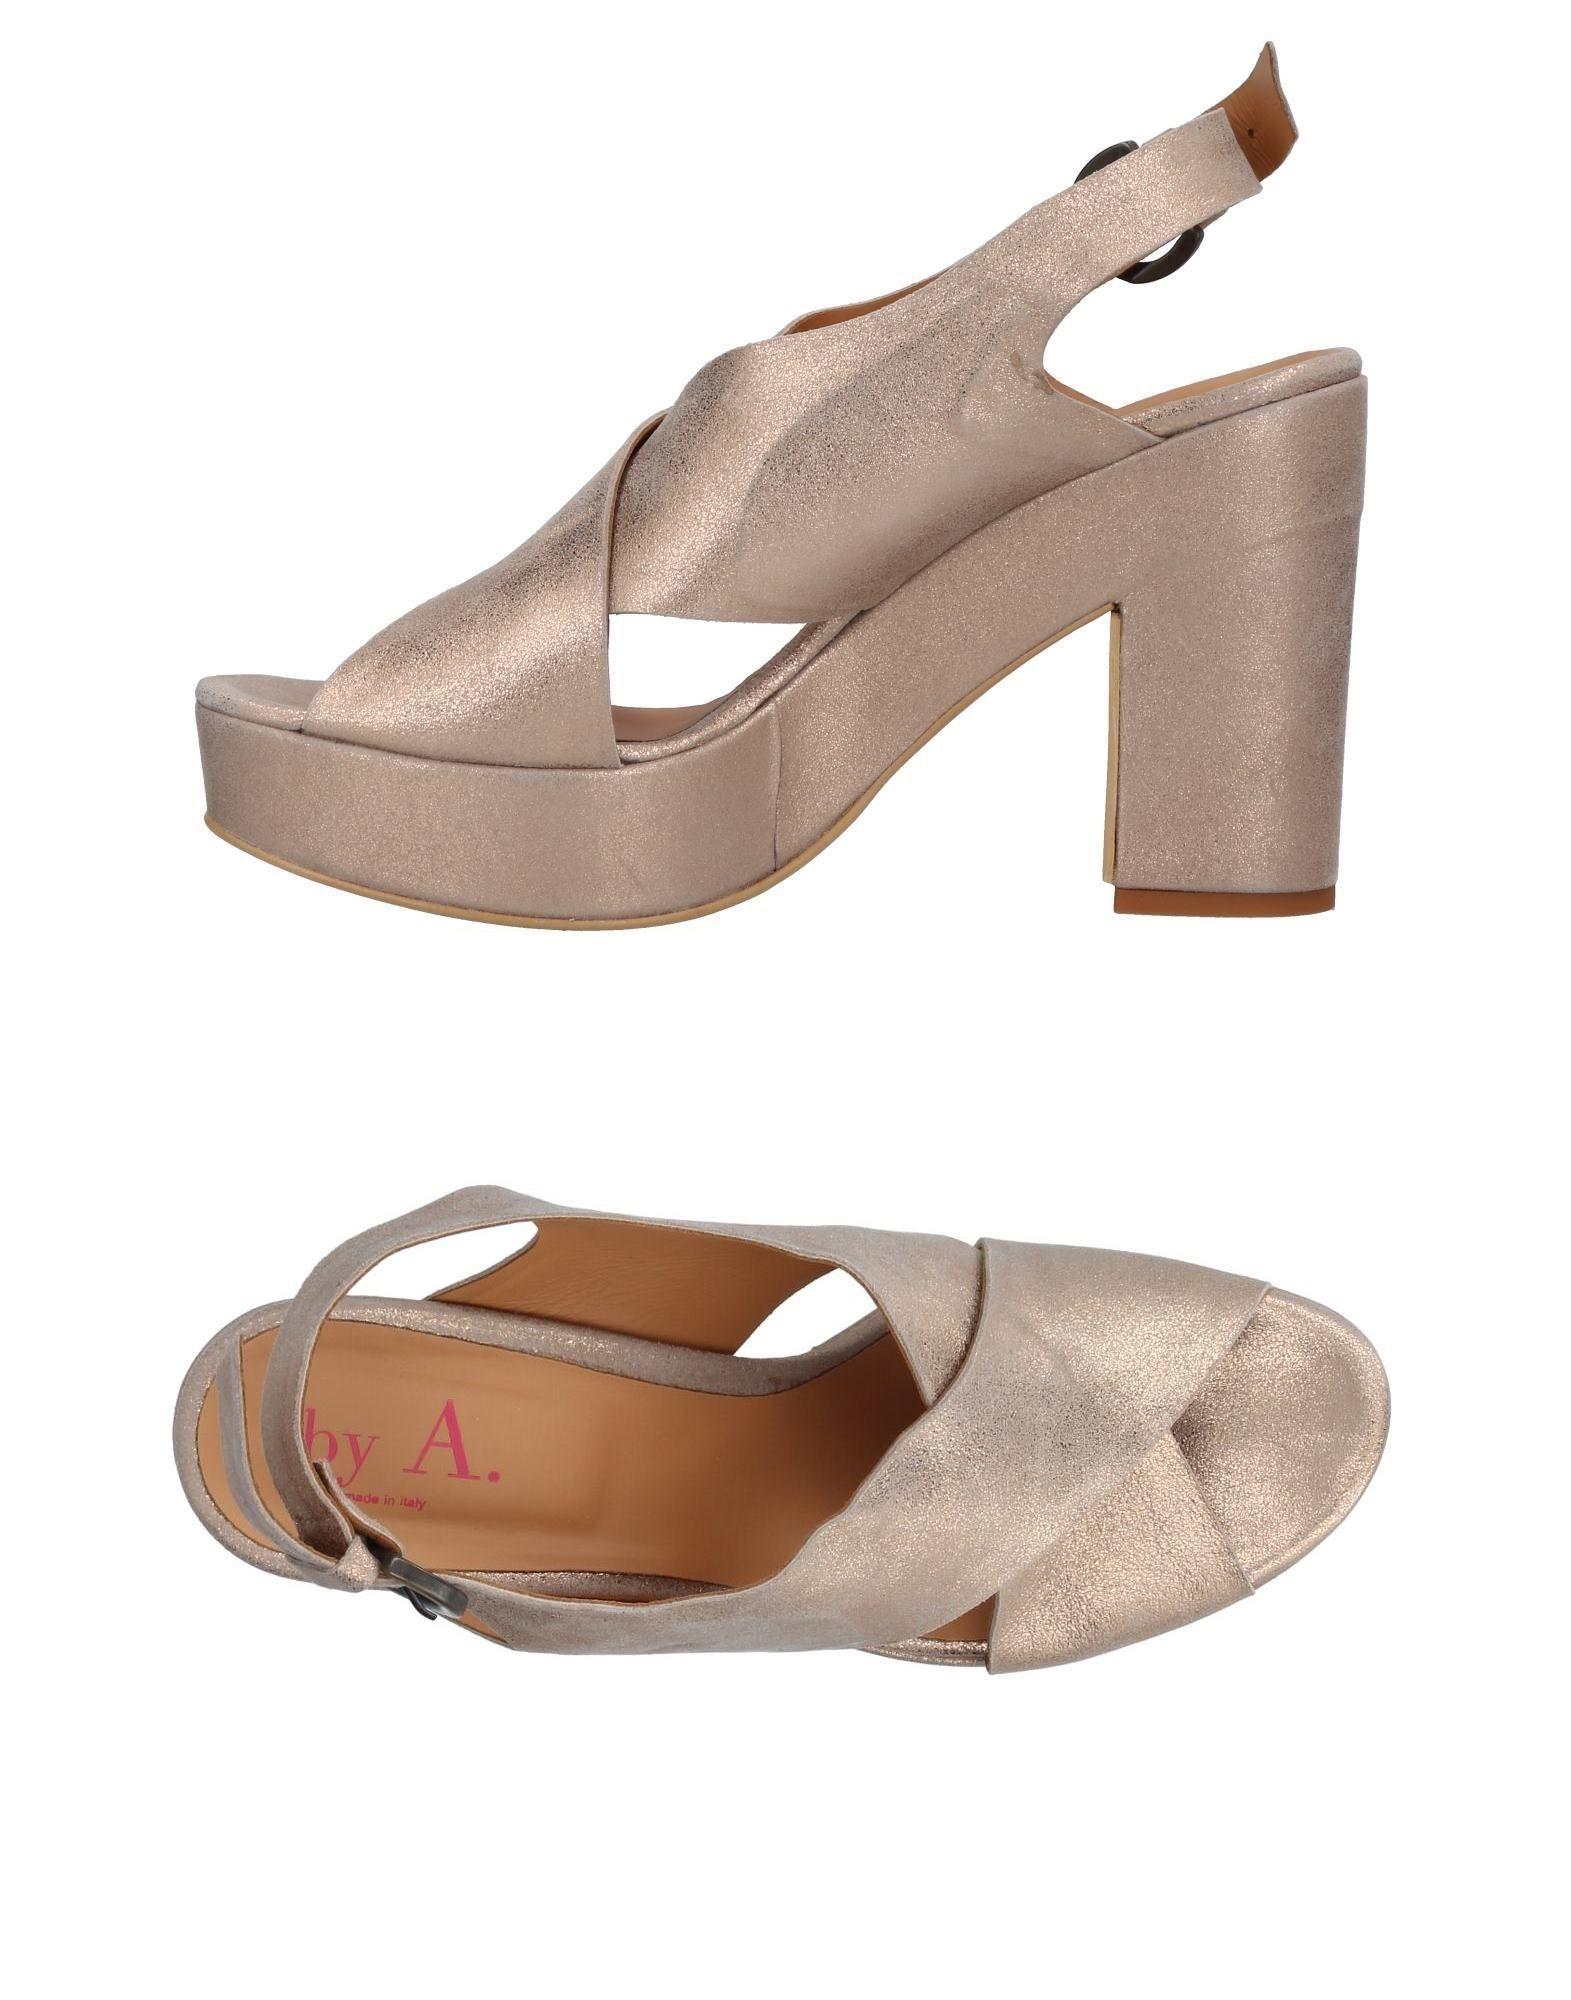 Sandales By A. Femme - Sandales By A. sur